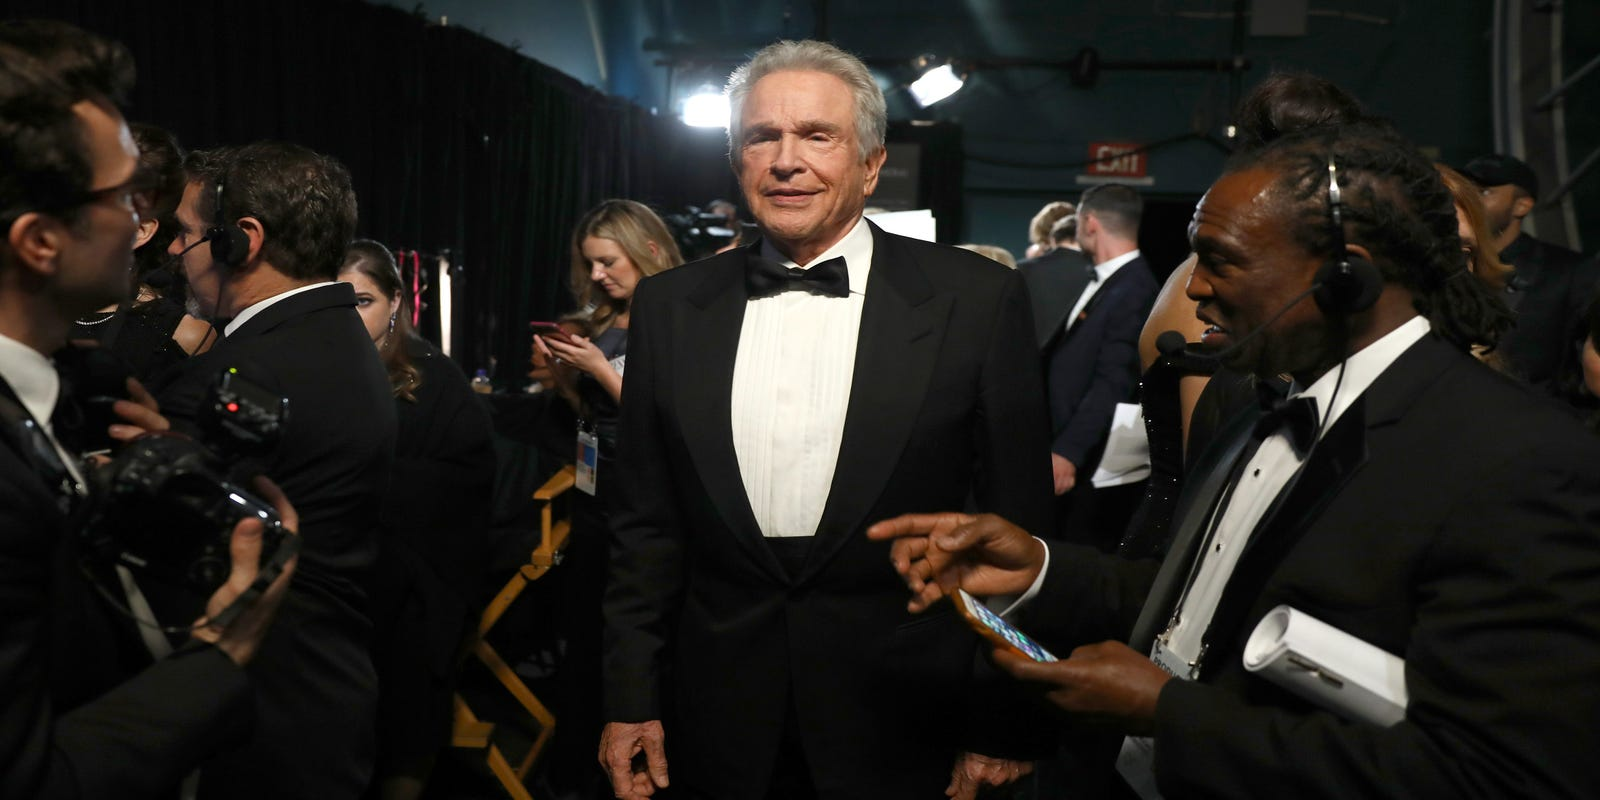 Oscars 2018: Warren Beatty, Meryl Streep, and what we saw backstage